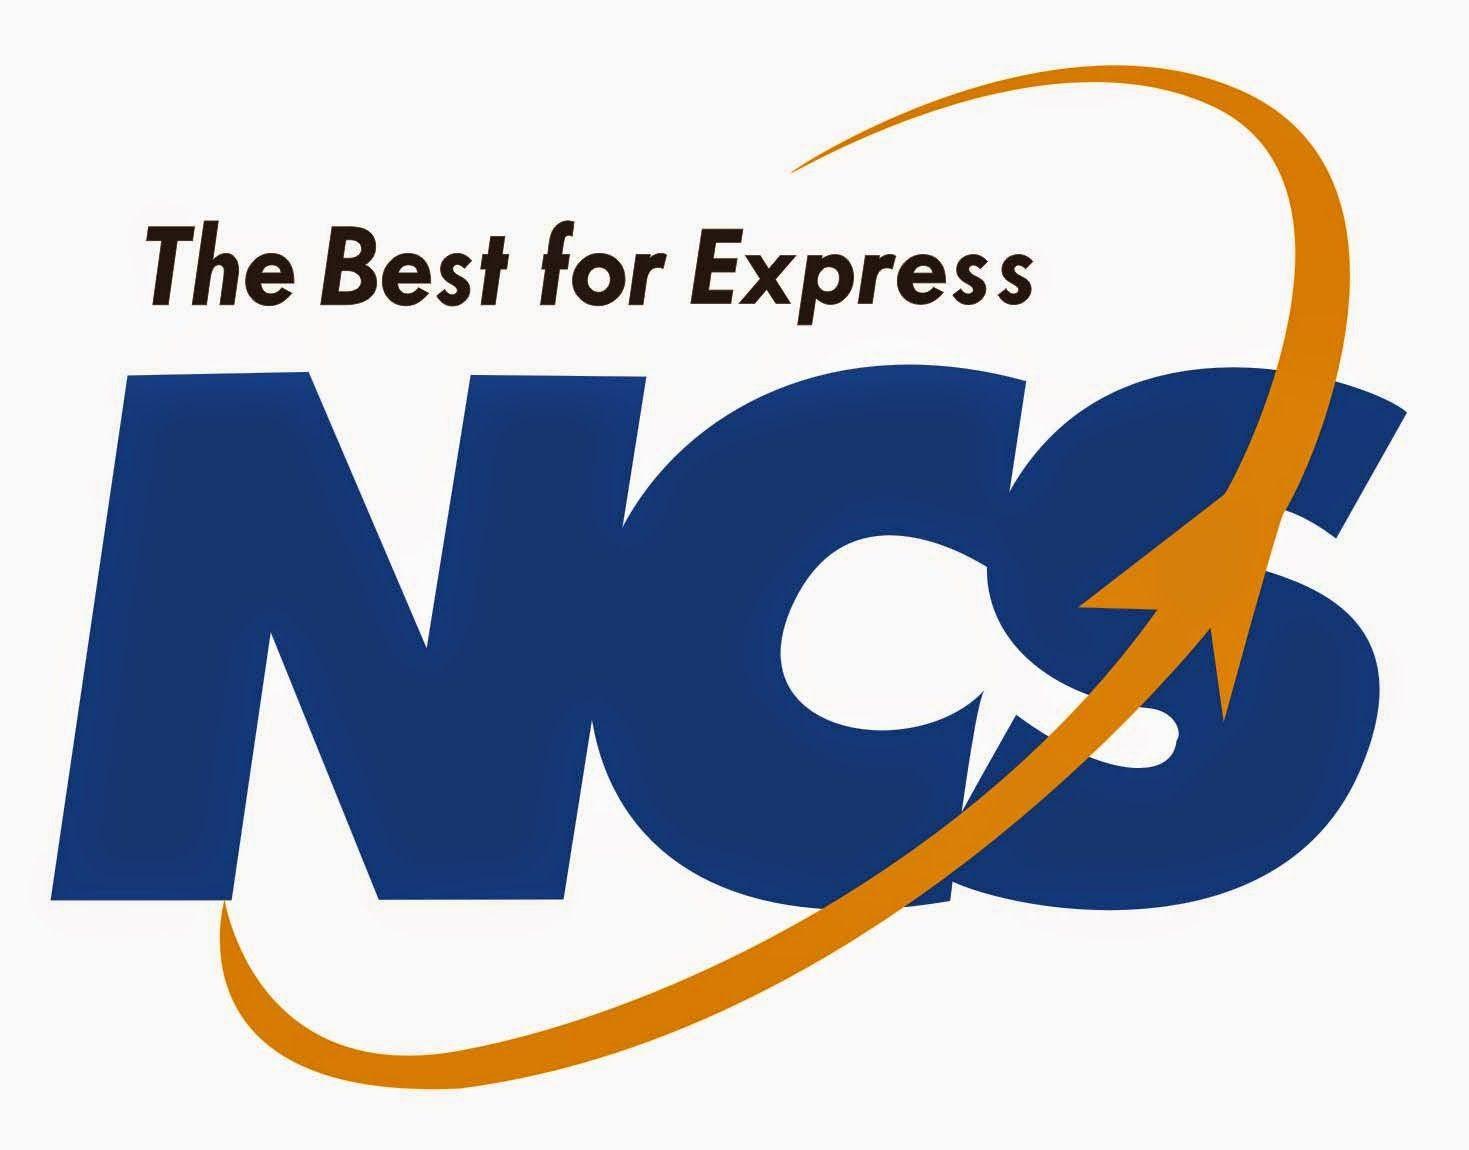 Cek Jasa Pengiriman Barang Kurir Ekspedisi Cargo Kantor Pusat Ncs The Best For Express Nct Solo Kota Palembang